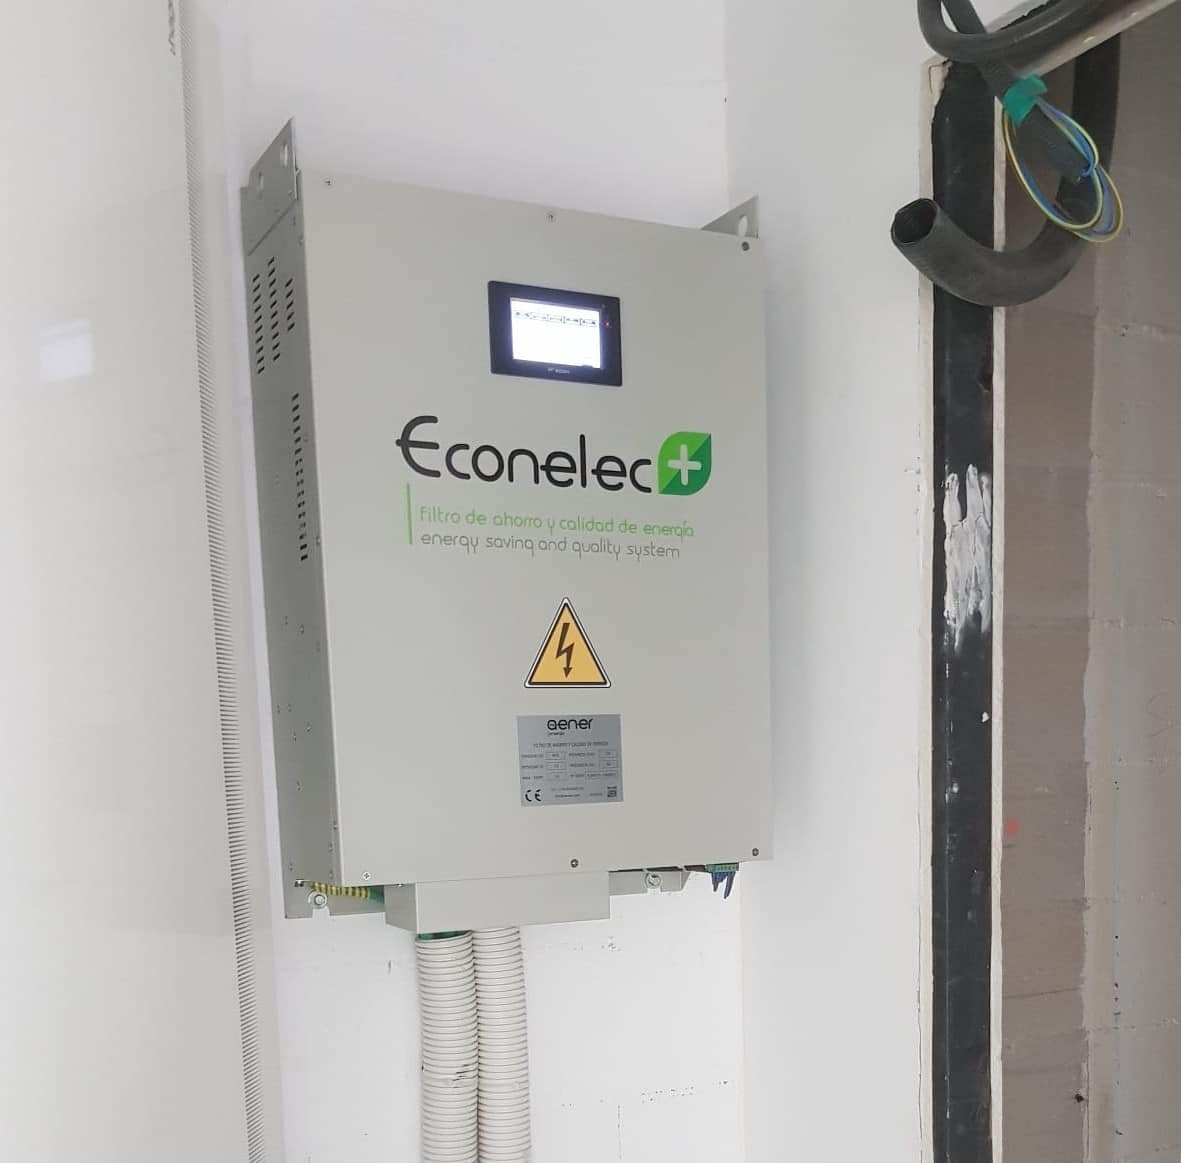 http://www.energybox-e.com/wp-content/uploads/2020/05/econelec-75-1.jpg